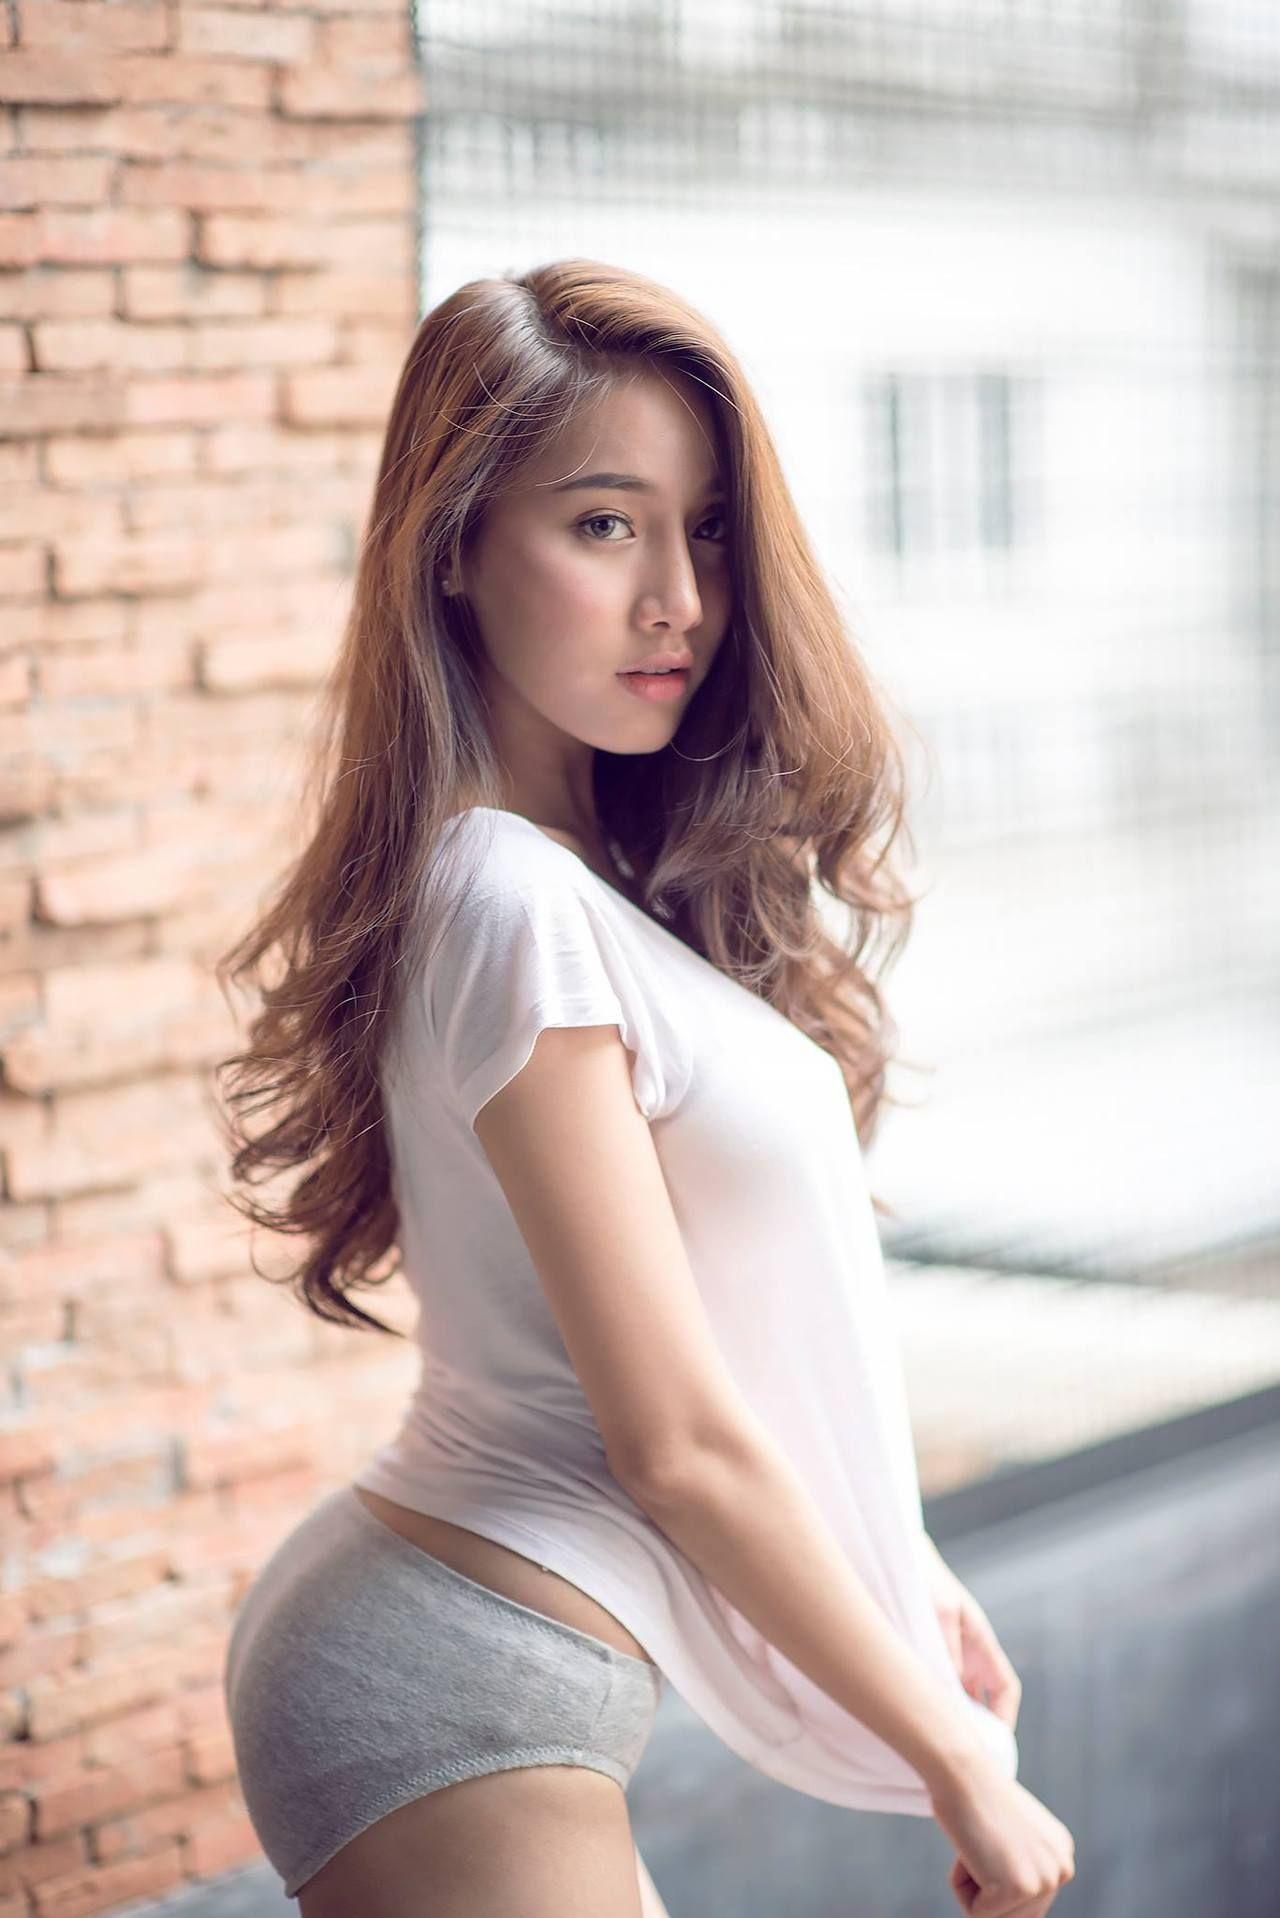 Thai Girls   Sexy In 2019  Asian Beauty, Cute Girls -2423